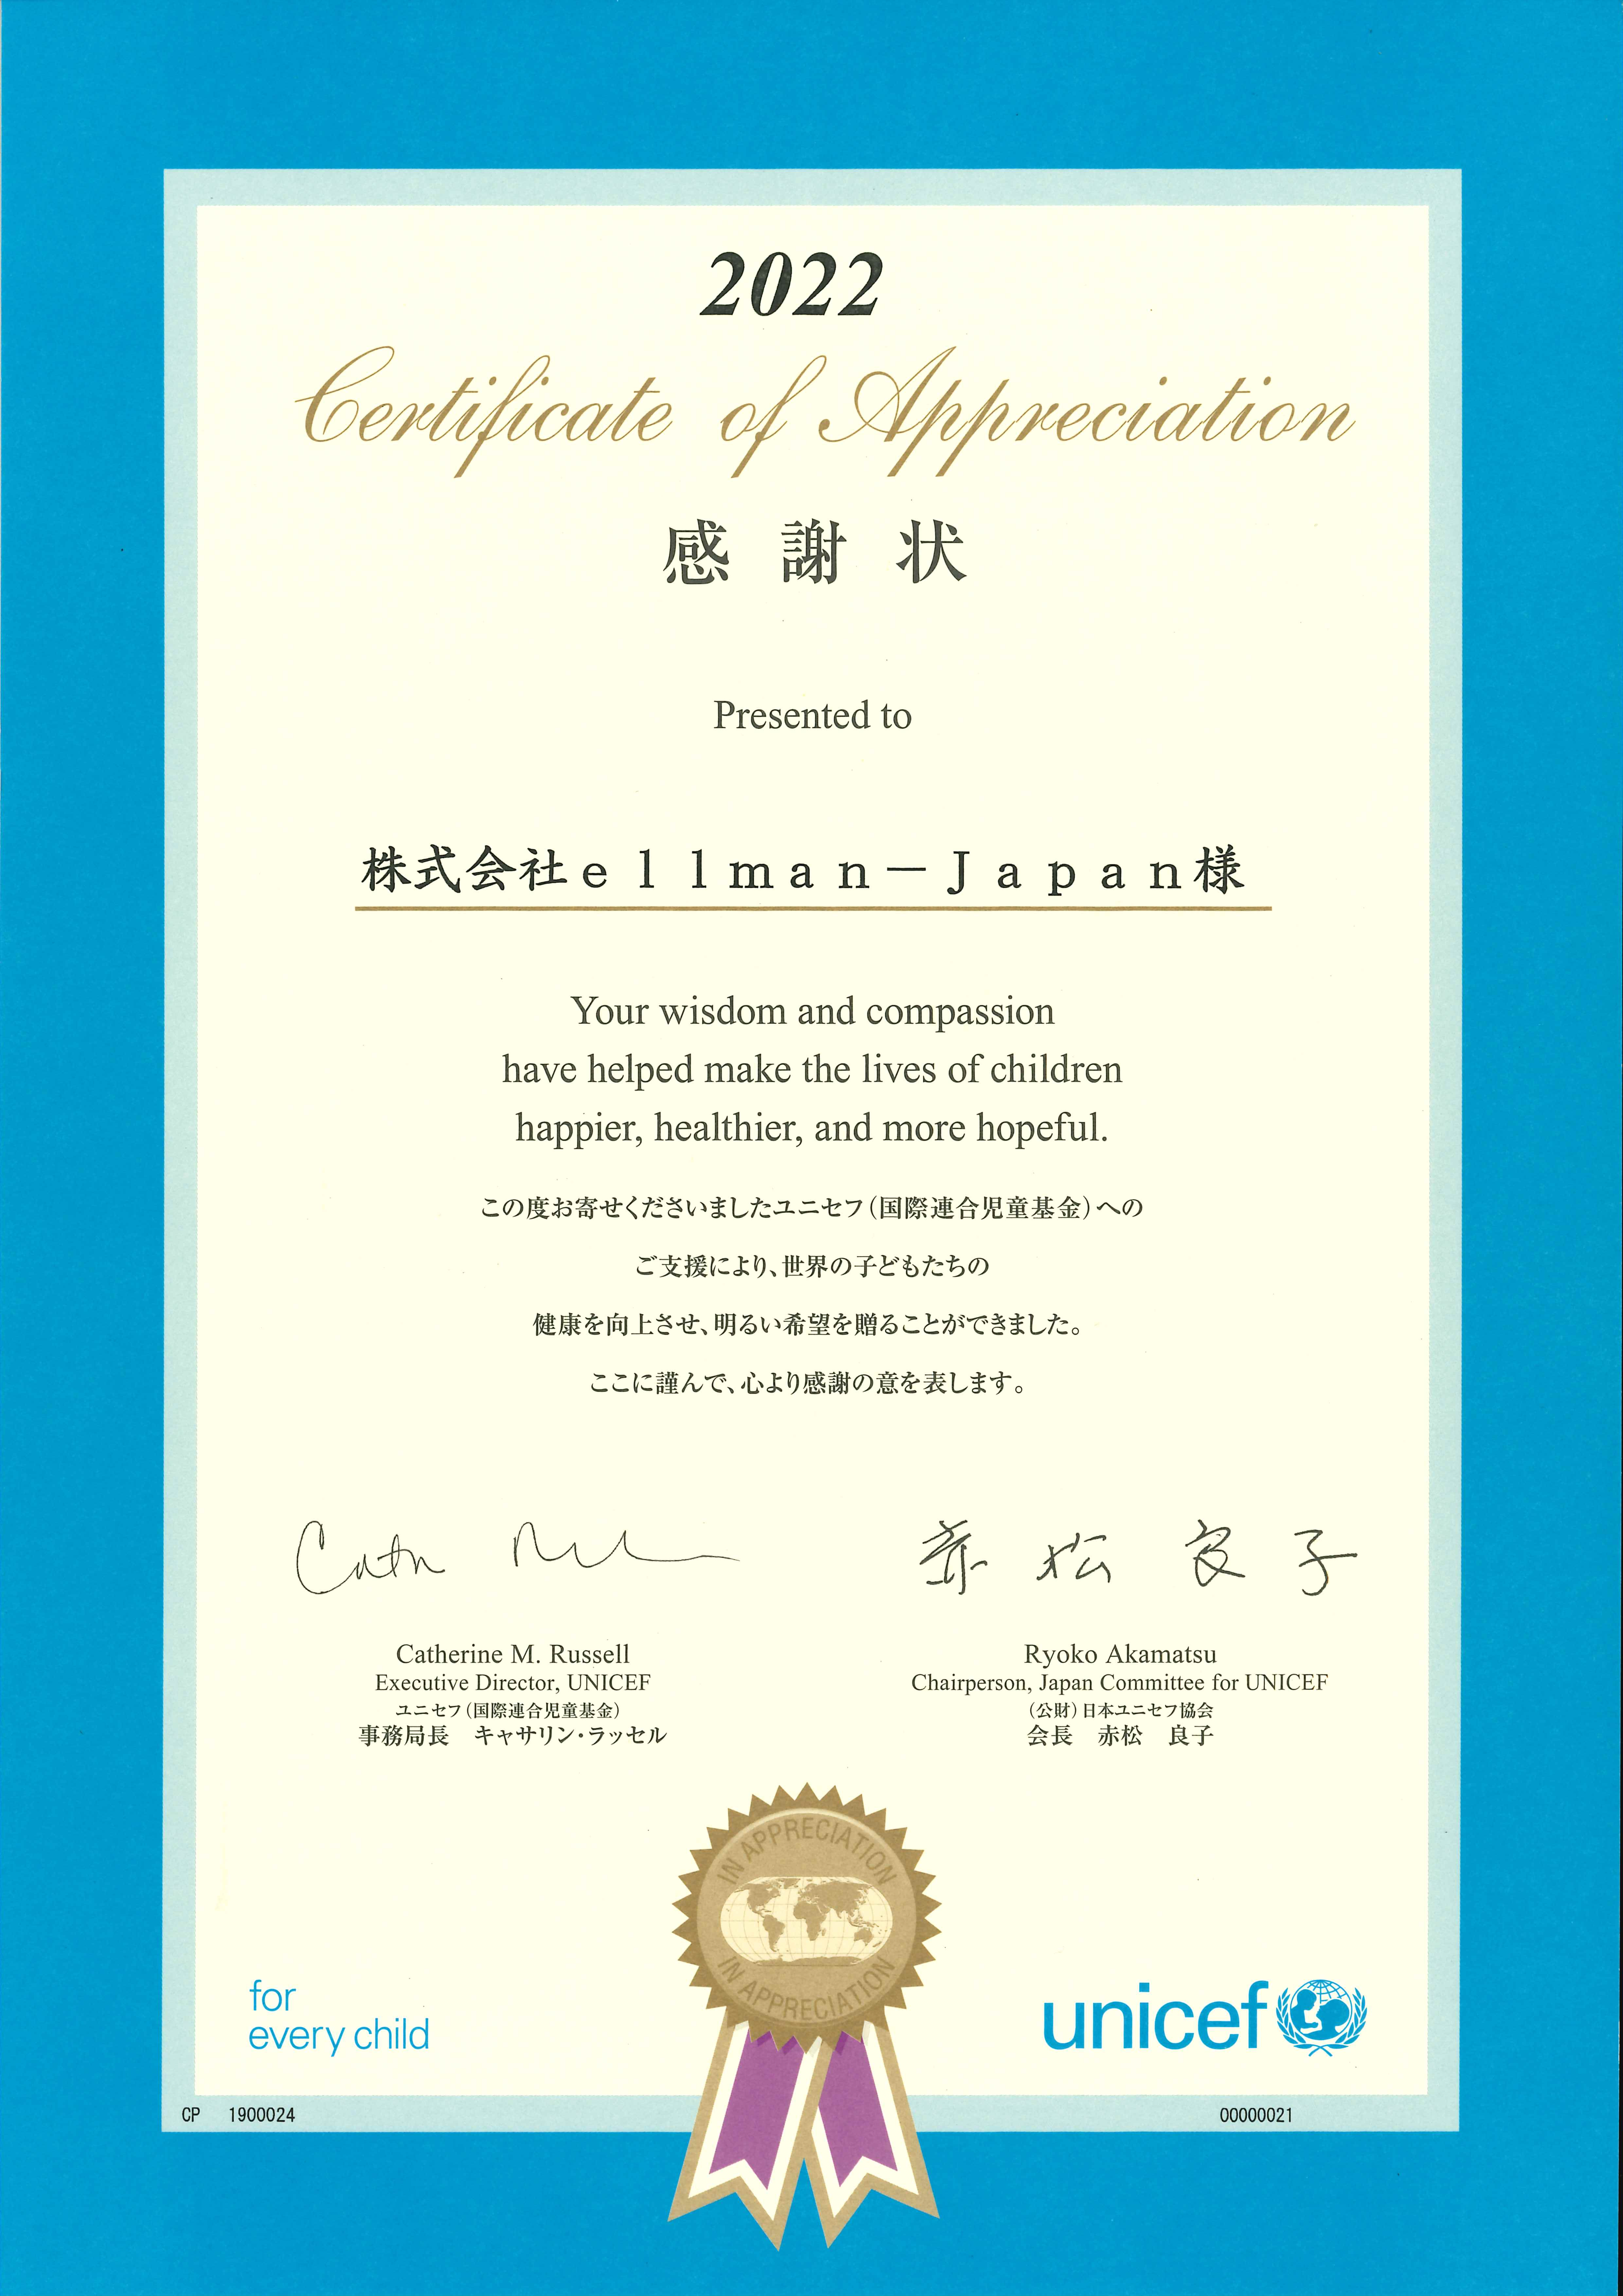 ellman-Japanのユニセフ募金、症状